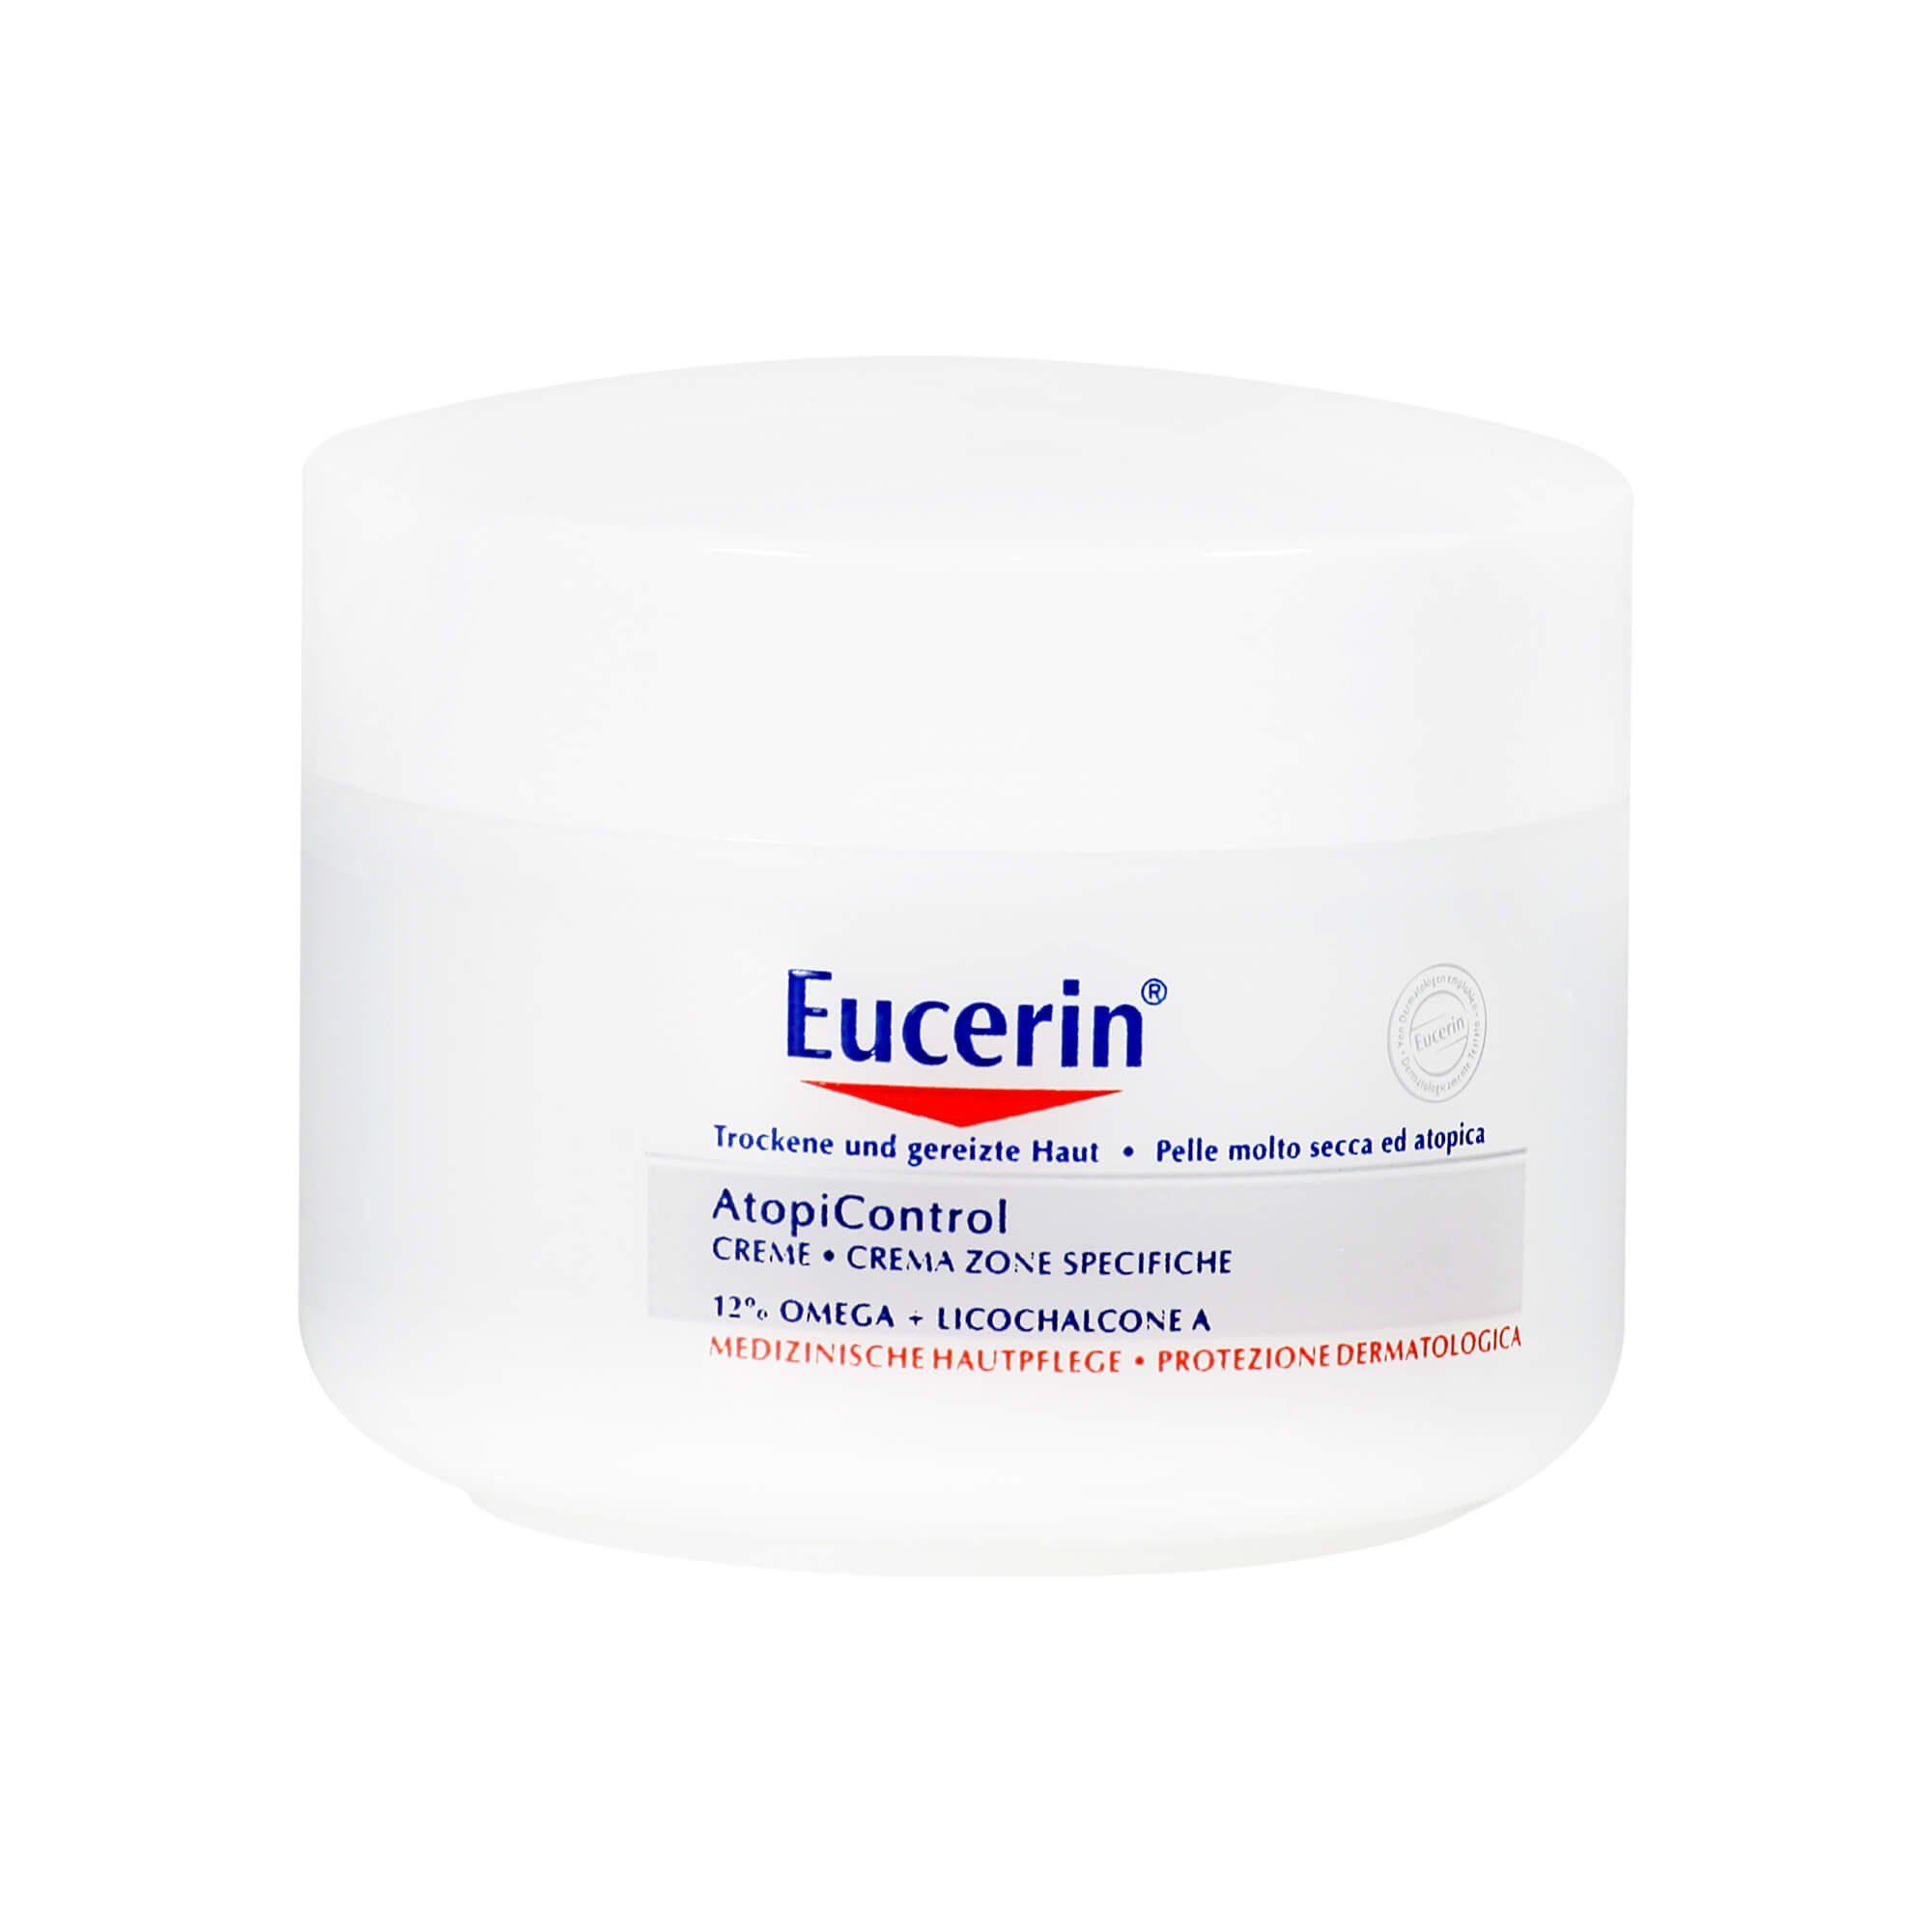 Eucerin AtopiControl Creme , 75 ml